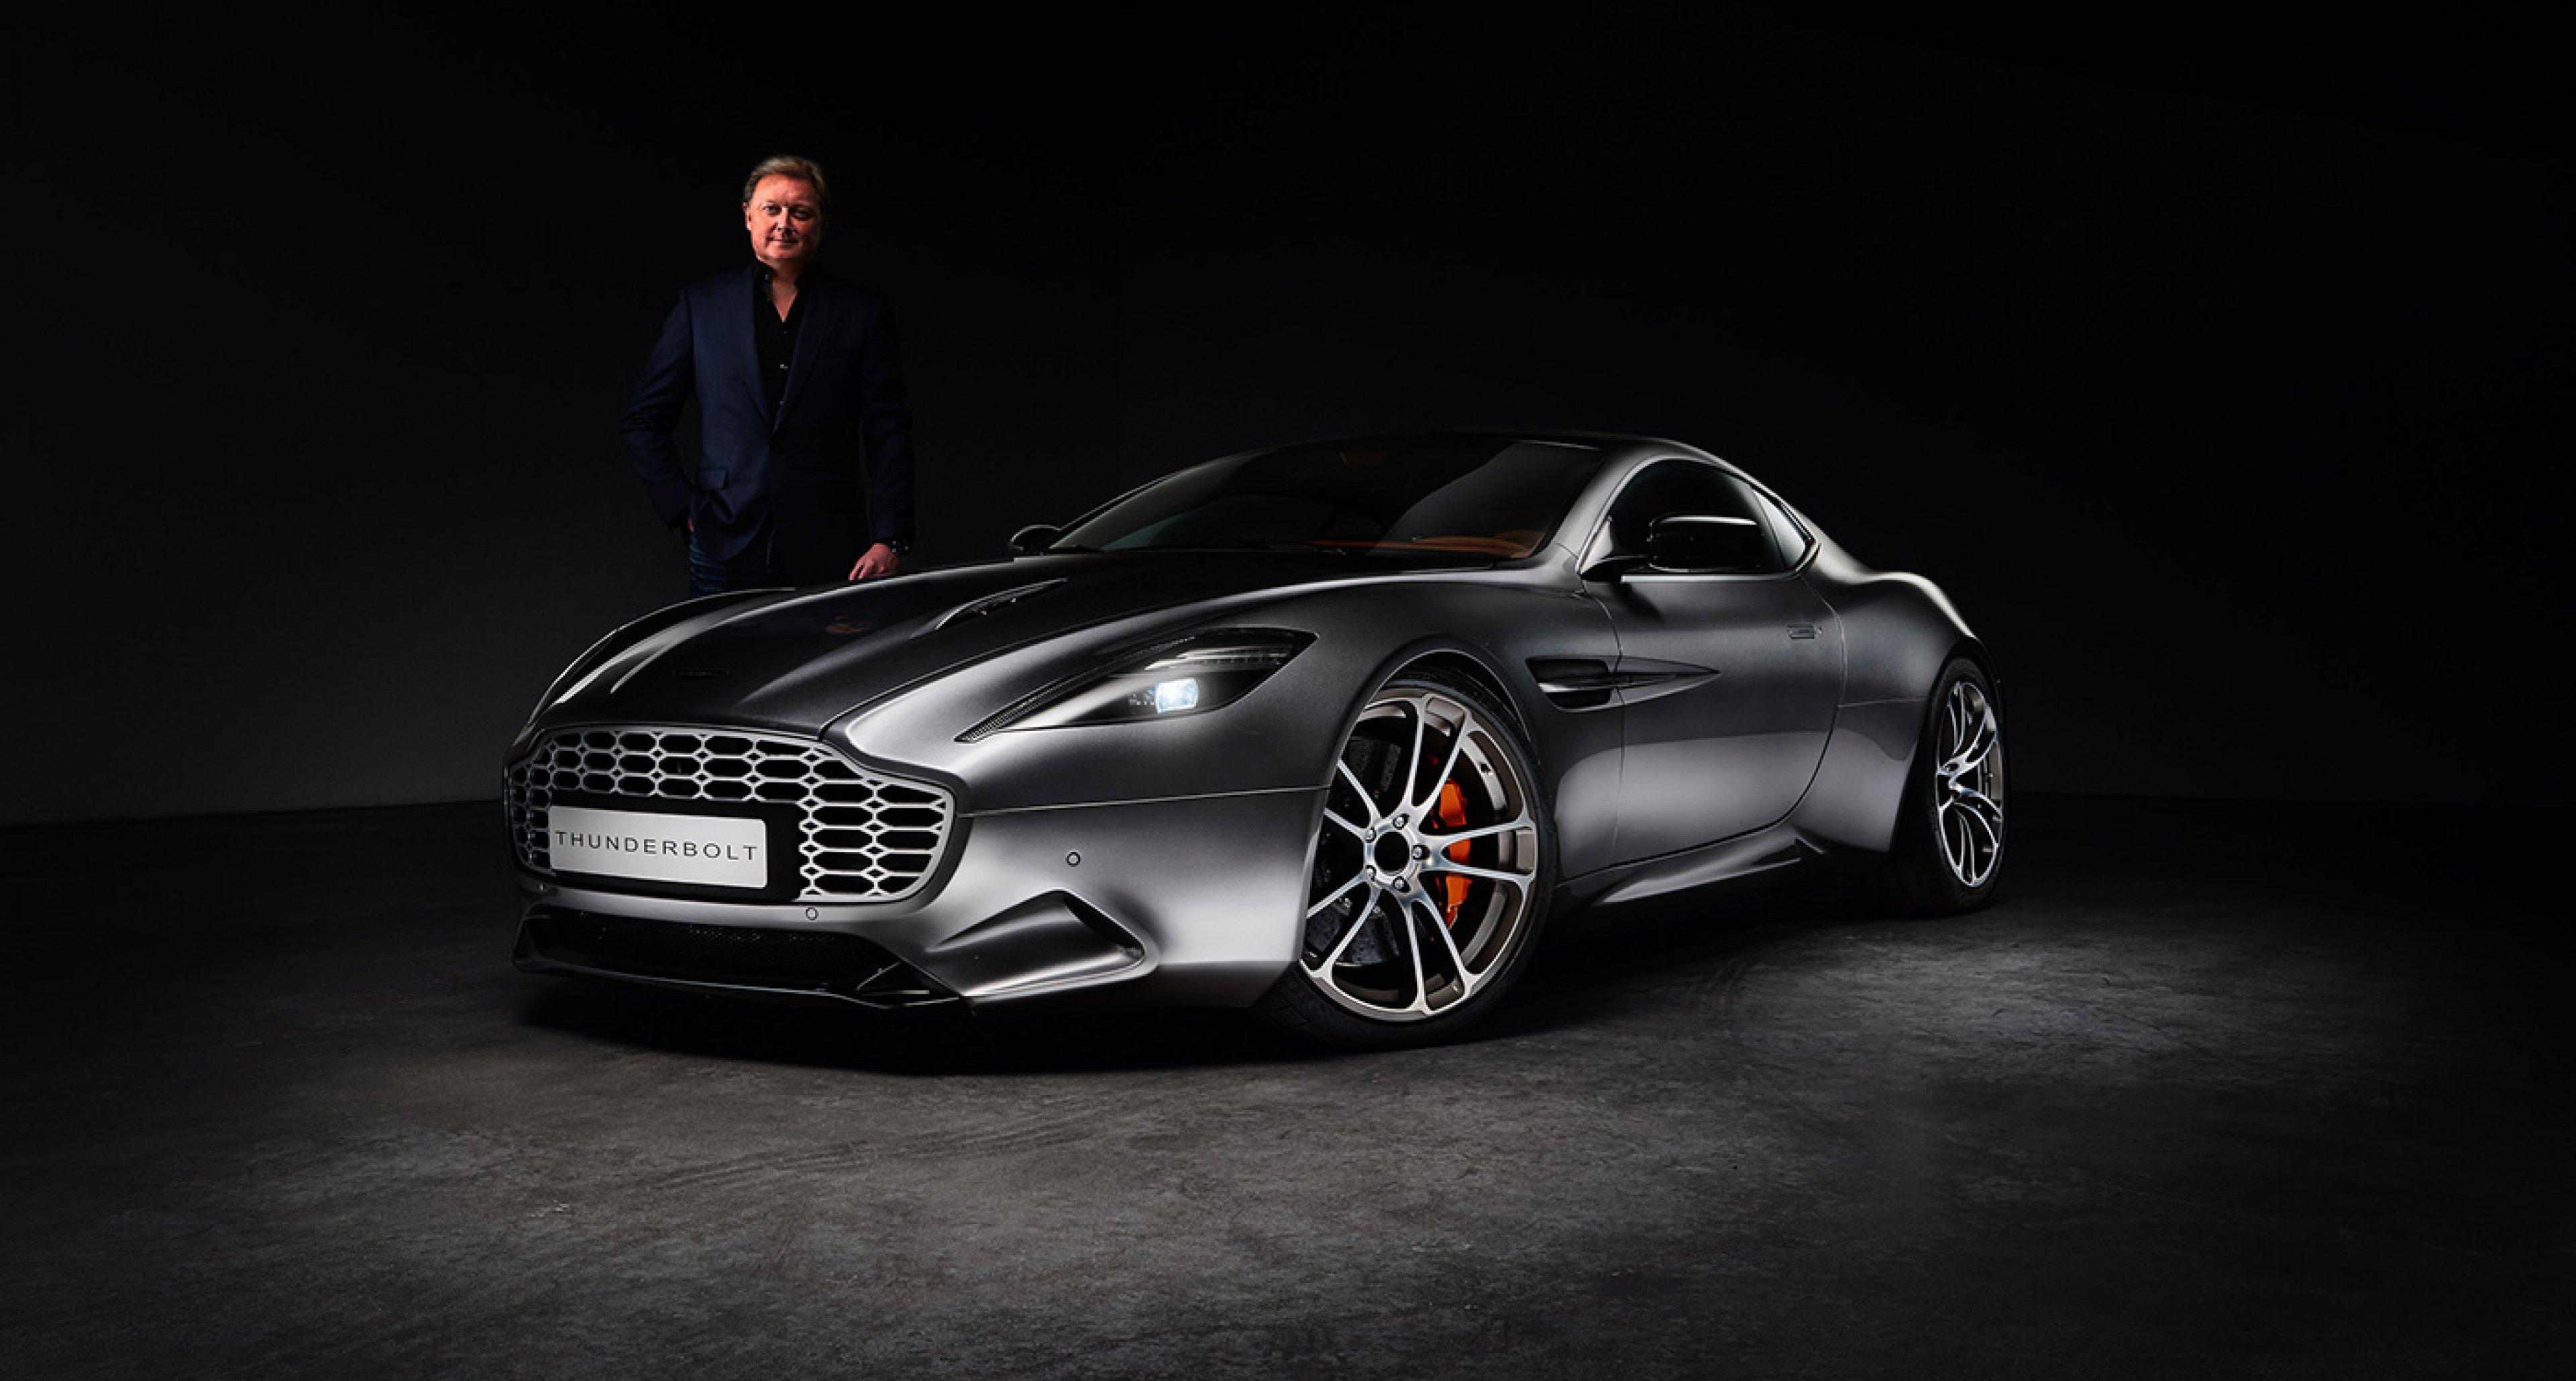 Fisker S Thunderbolt Is A Re Designed Aston Martin Vanquish Classic Driver Magazine